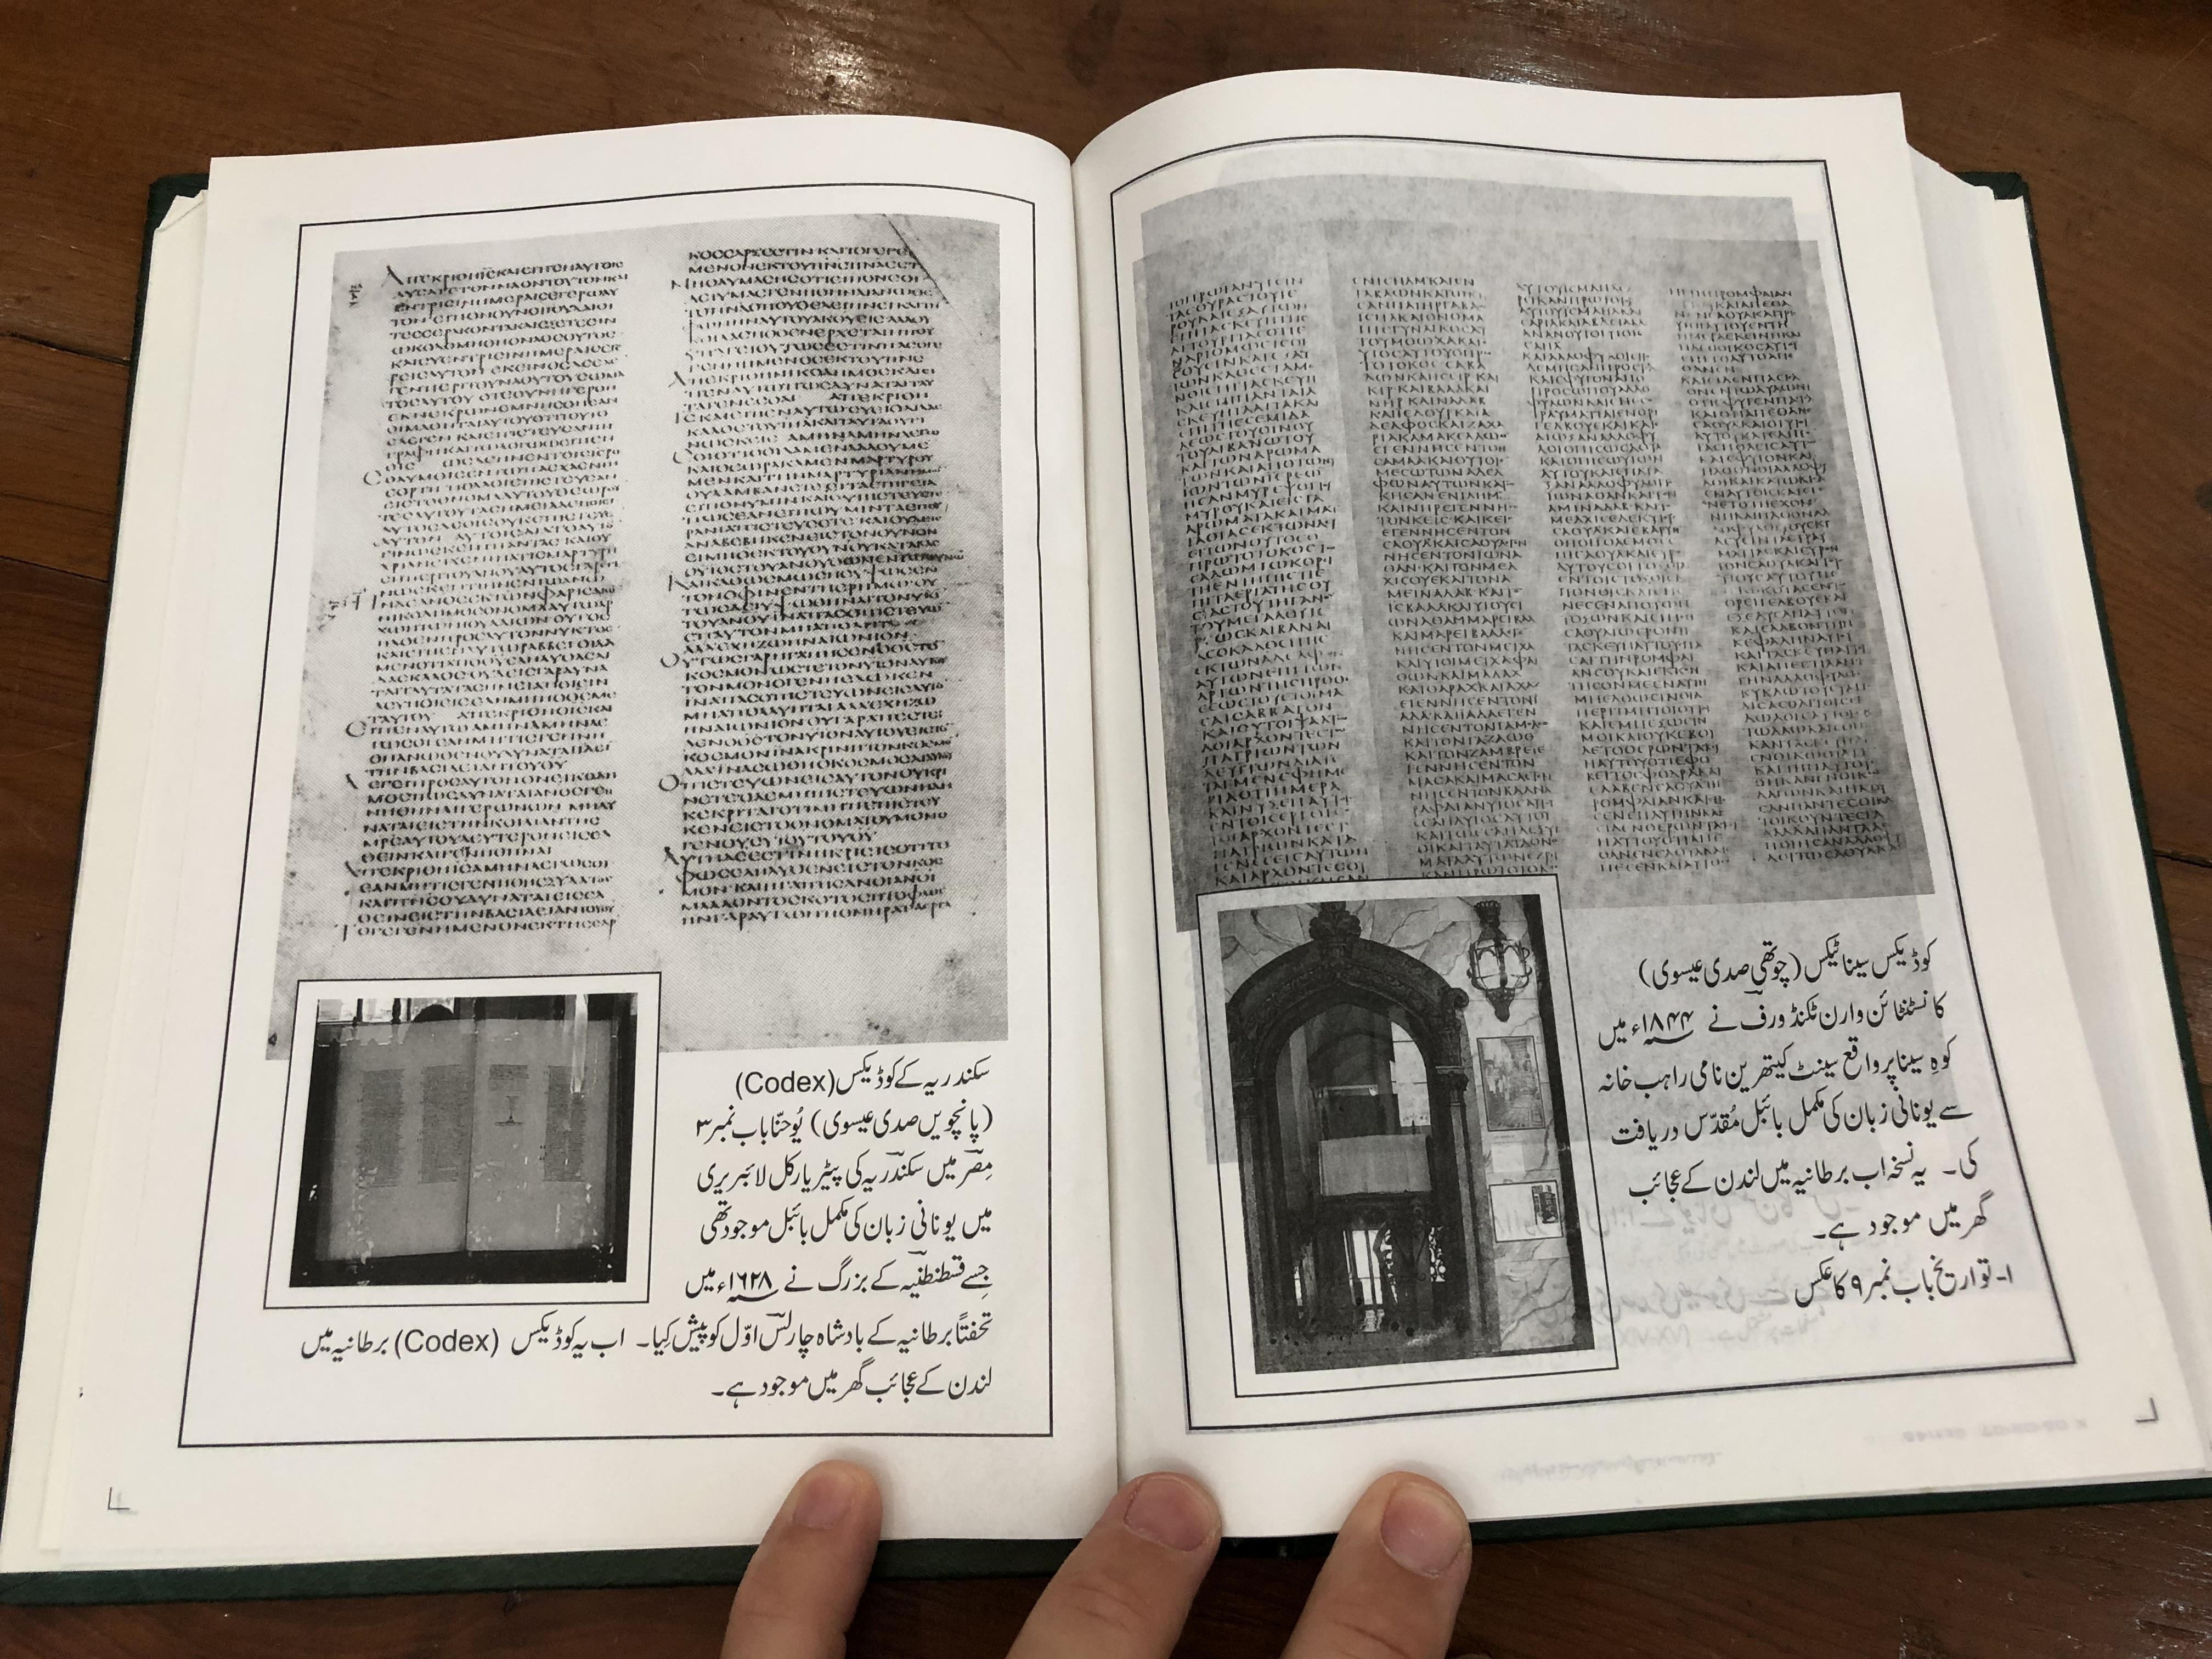 urdu-study-new-testament-2nd-edition-a-real-study-new-testament-pakistan-bible-society-2012-15-.jpg